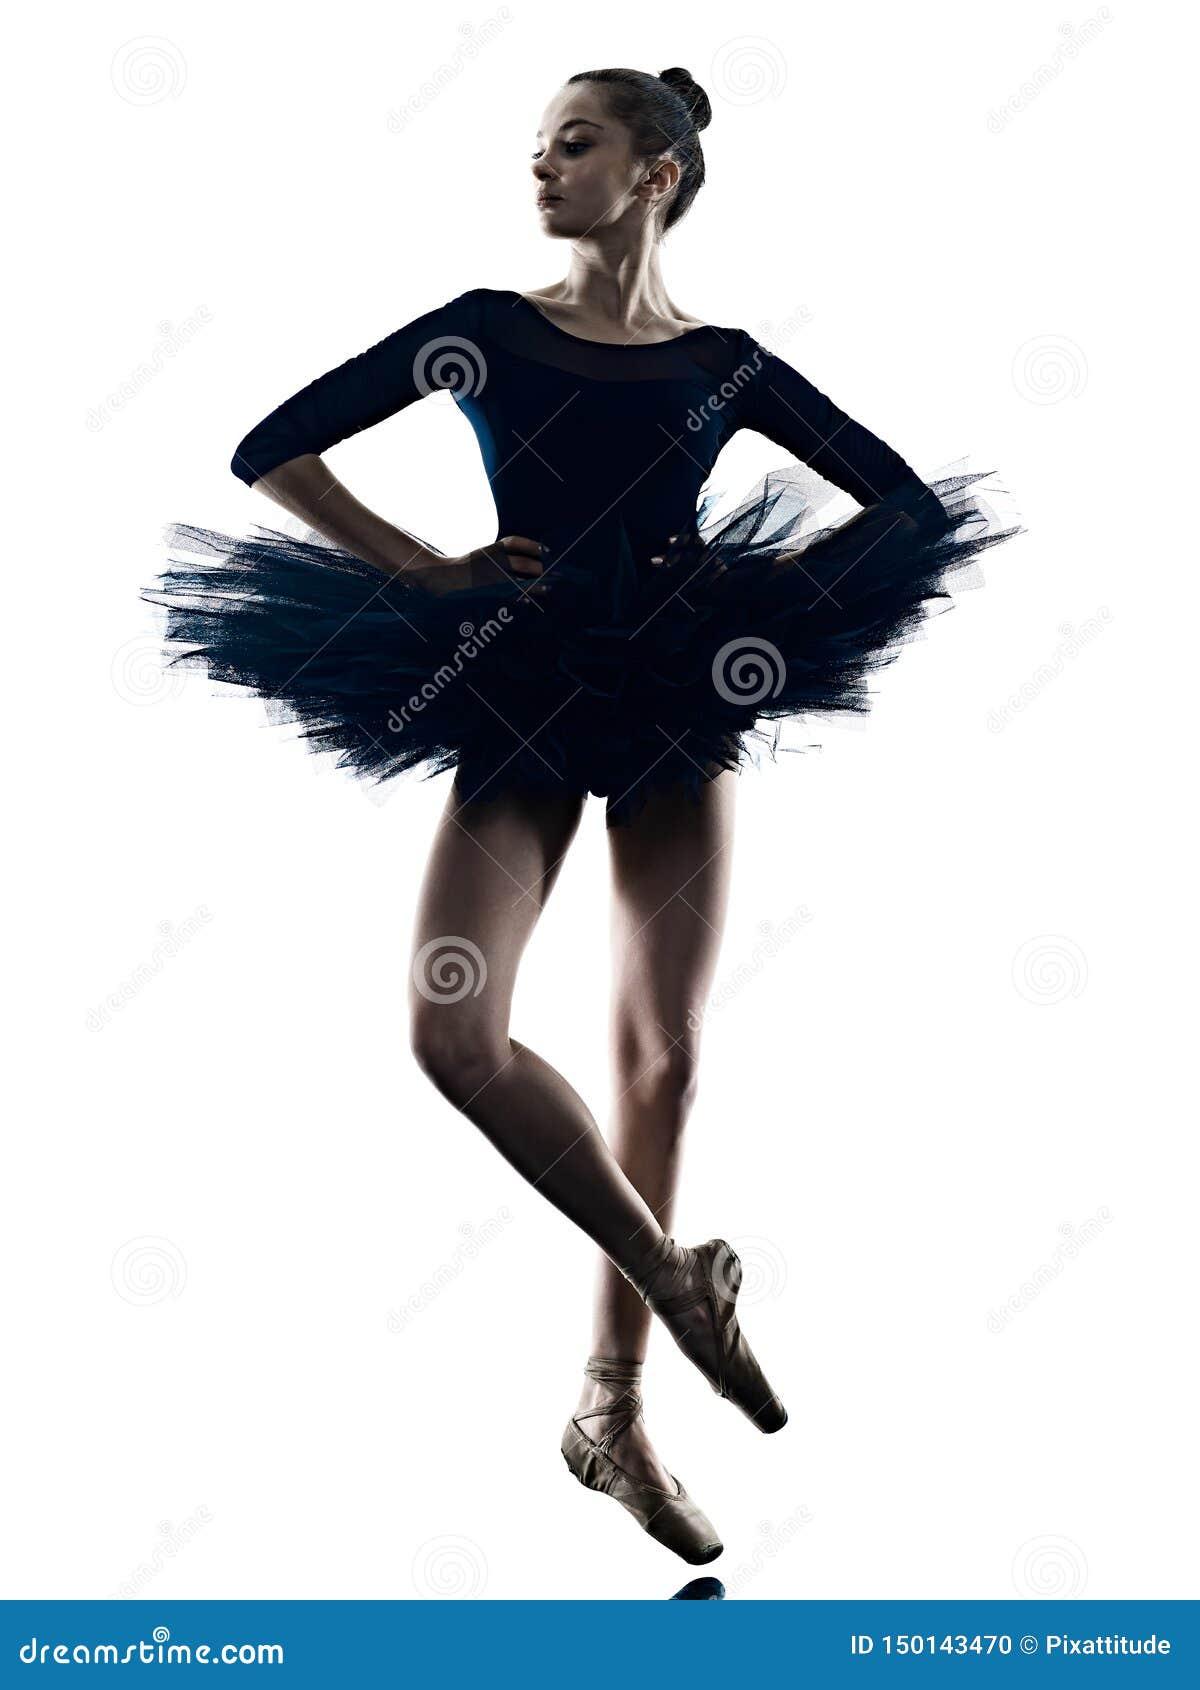 Young Woman Ballerina Ballet Dancer Dancing With Tutu In